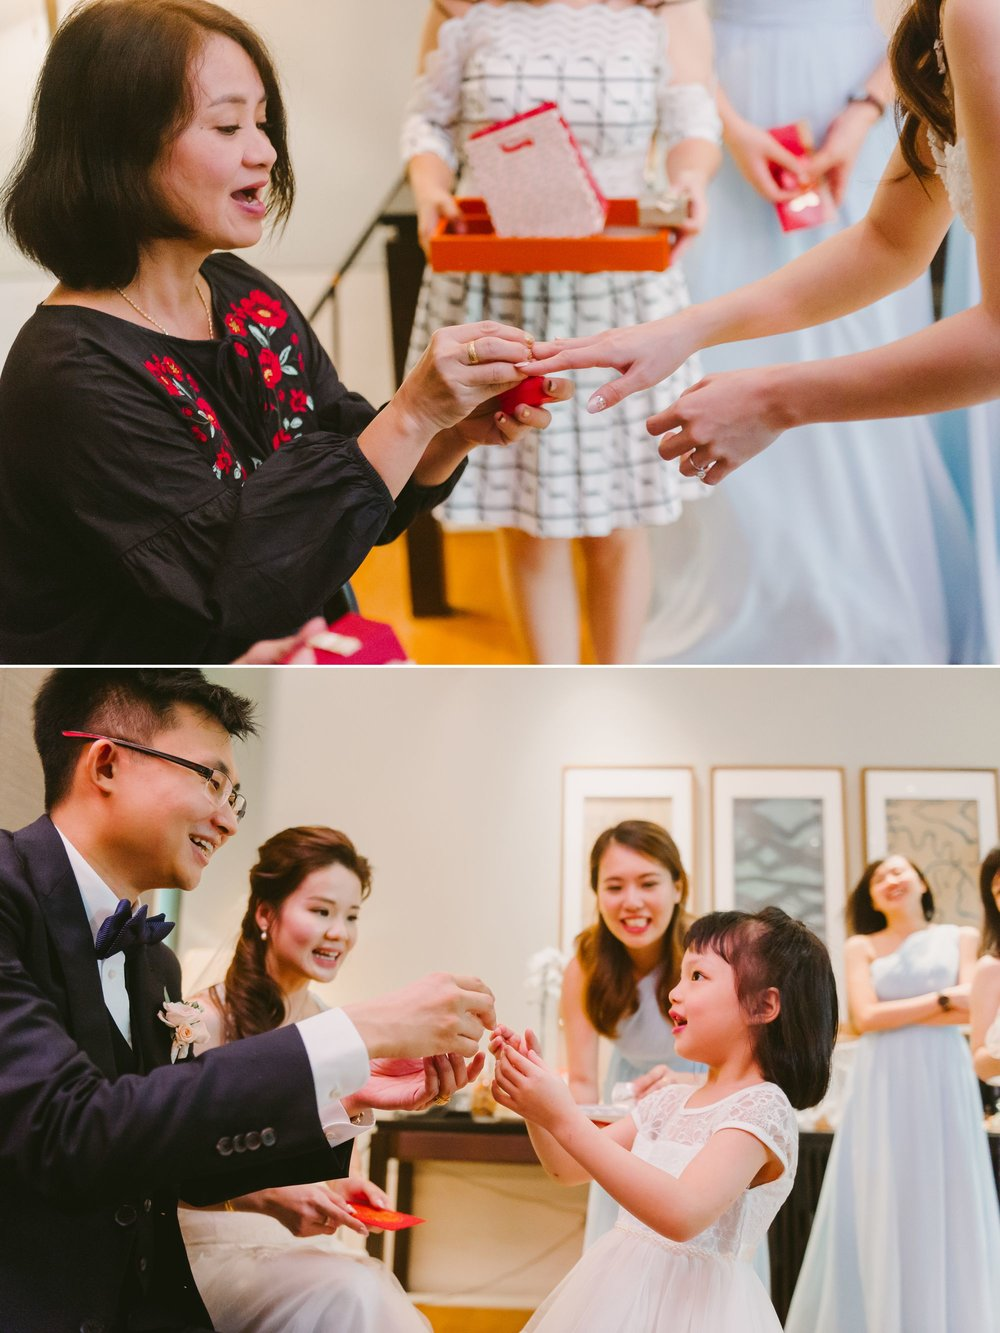 capella_singapore_wedding_ 17.jpg